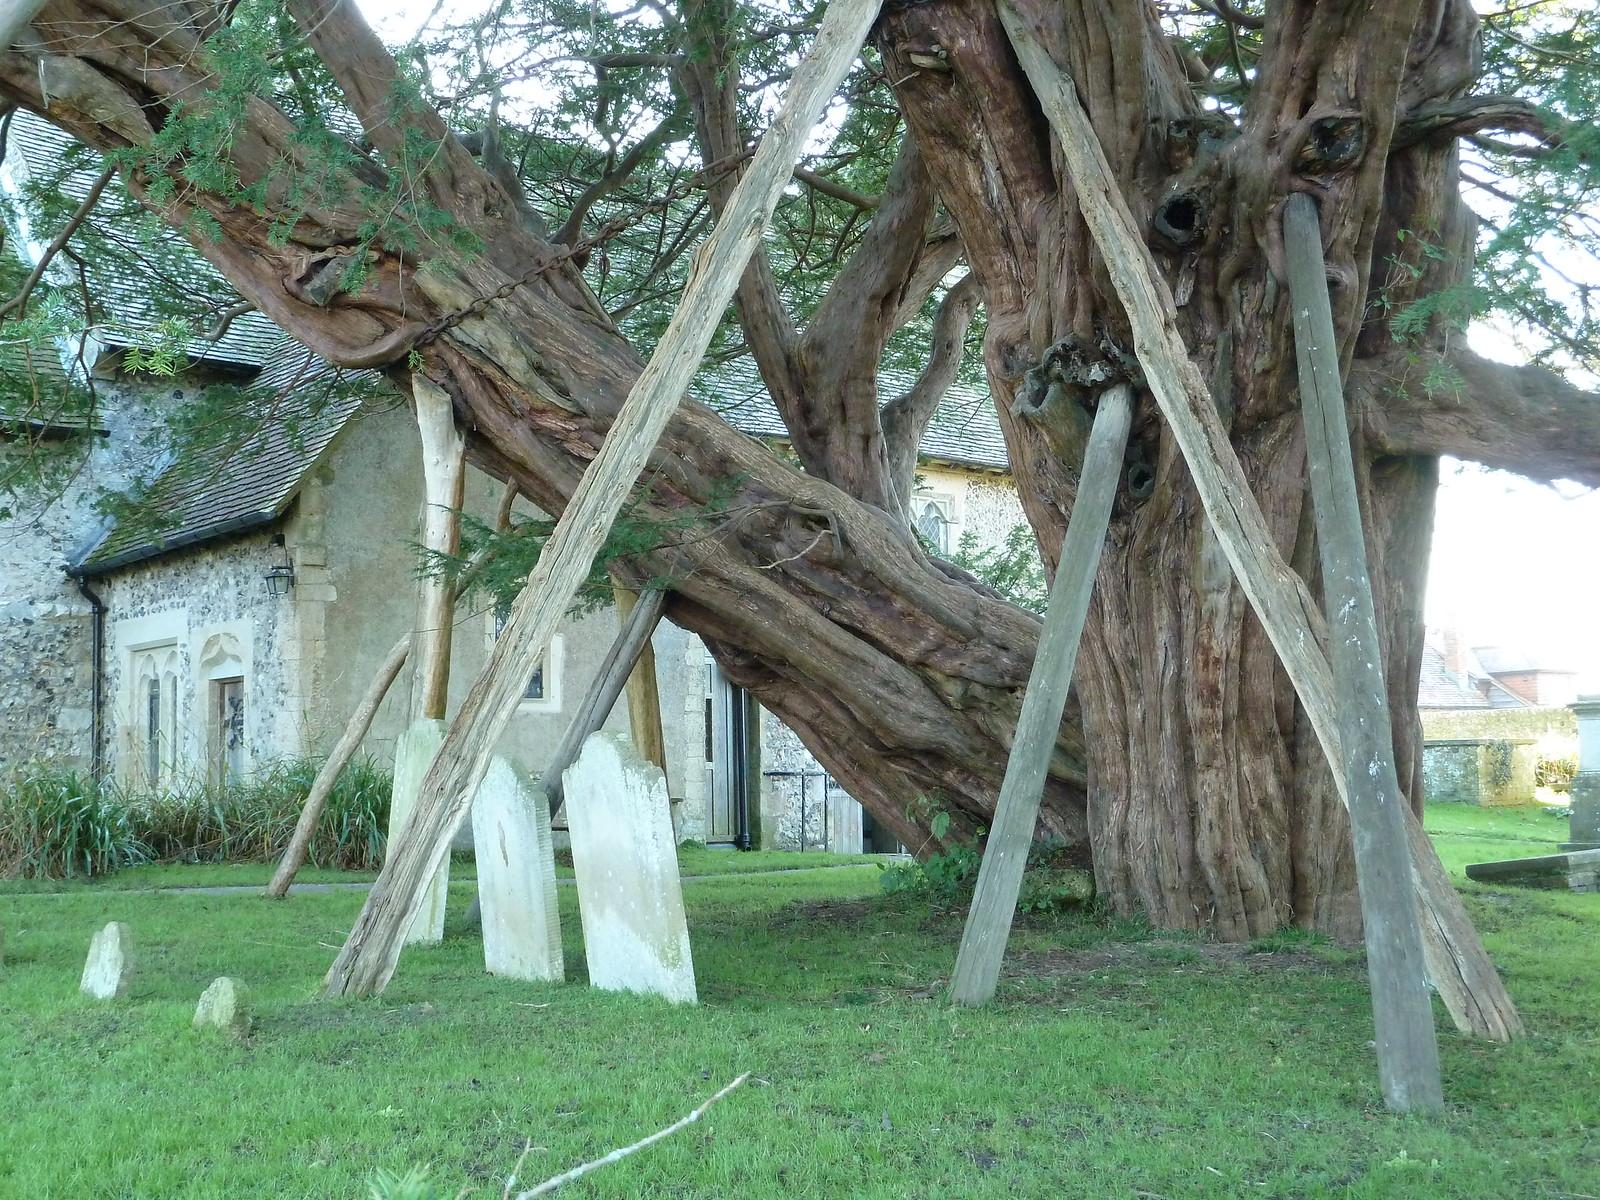 Ancient Yew (Berwick to Birling Gap) Ancient Yew Tree, Wilmington church